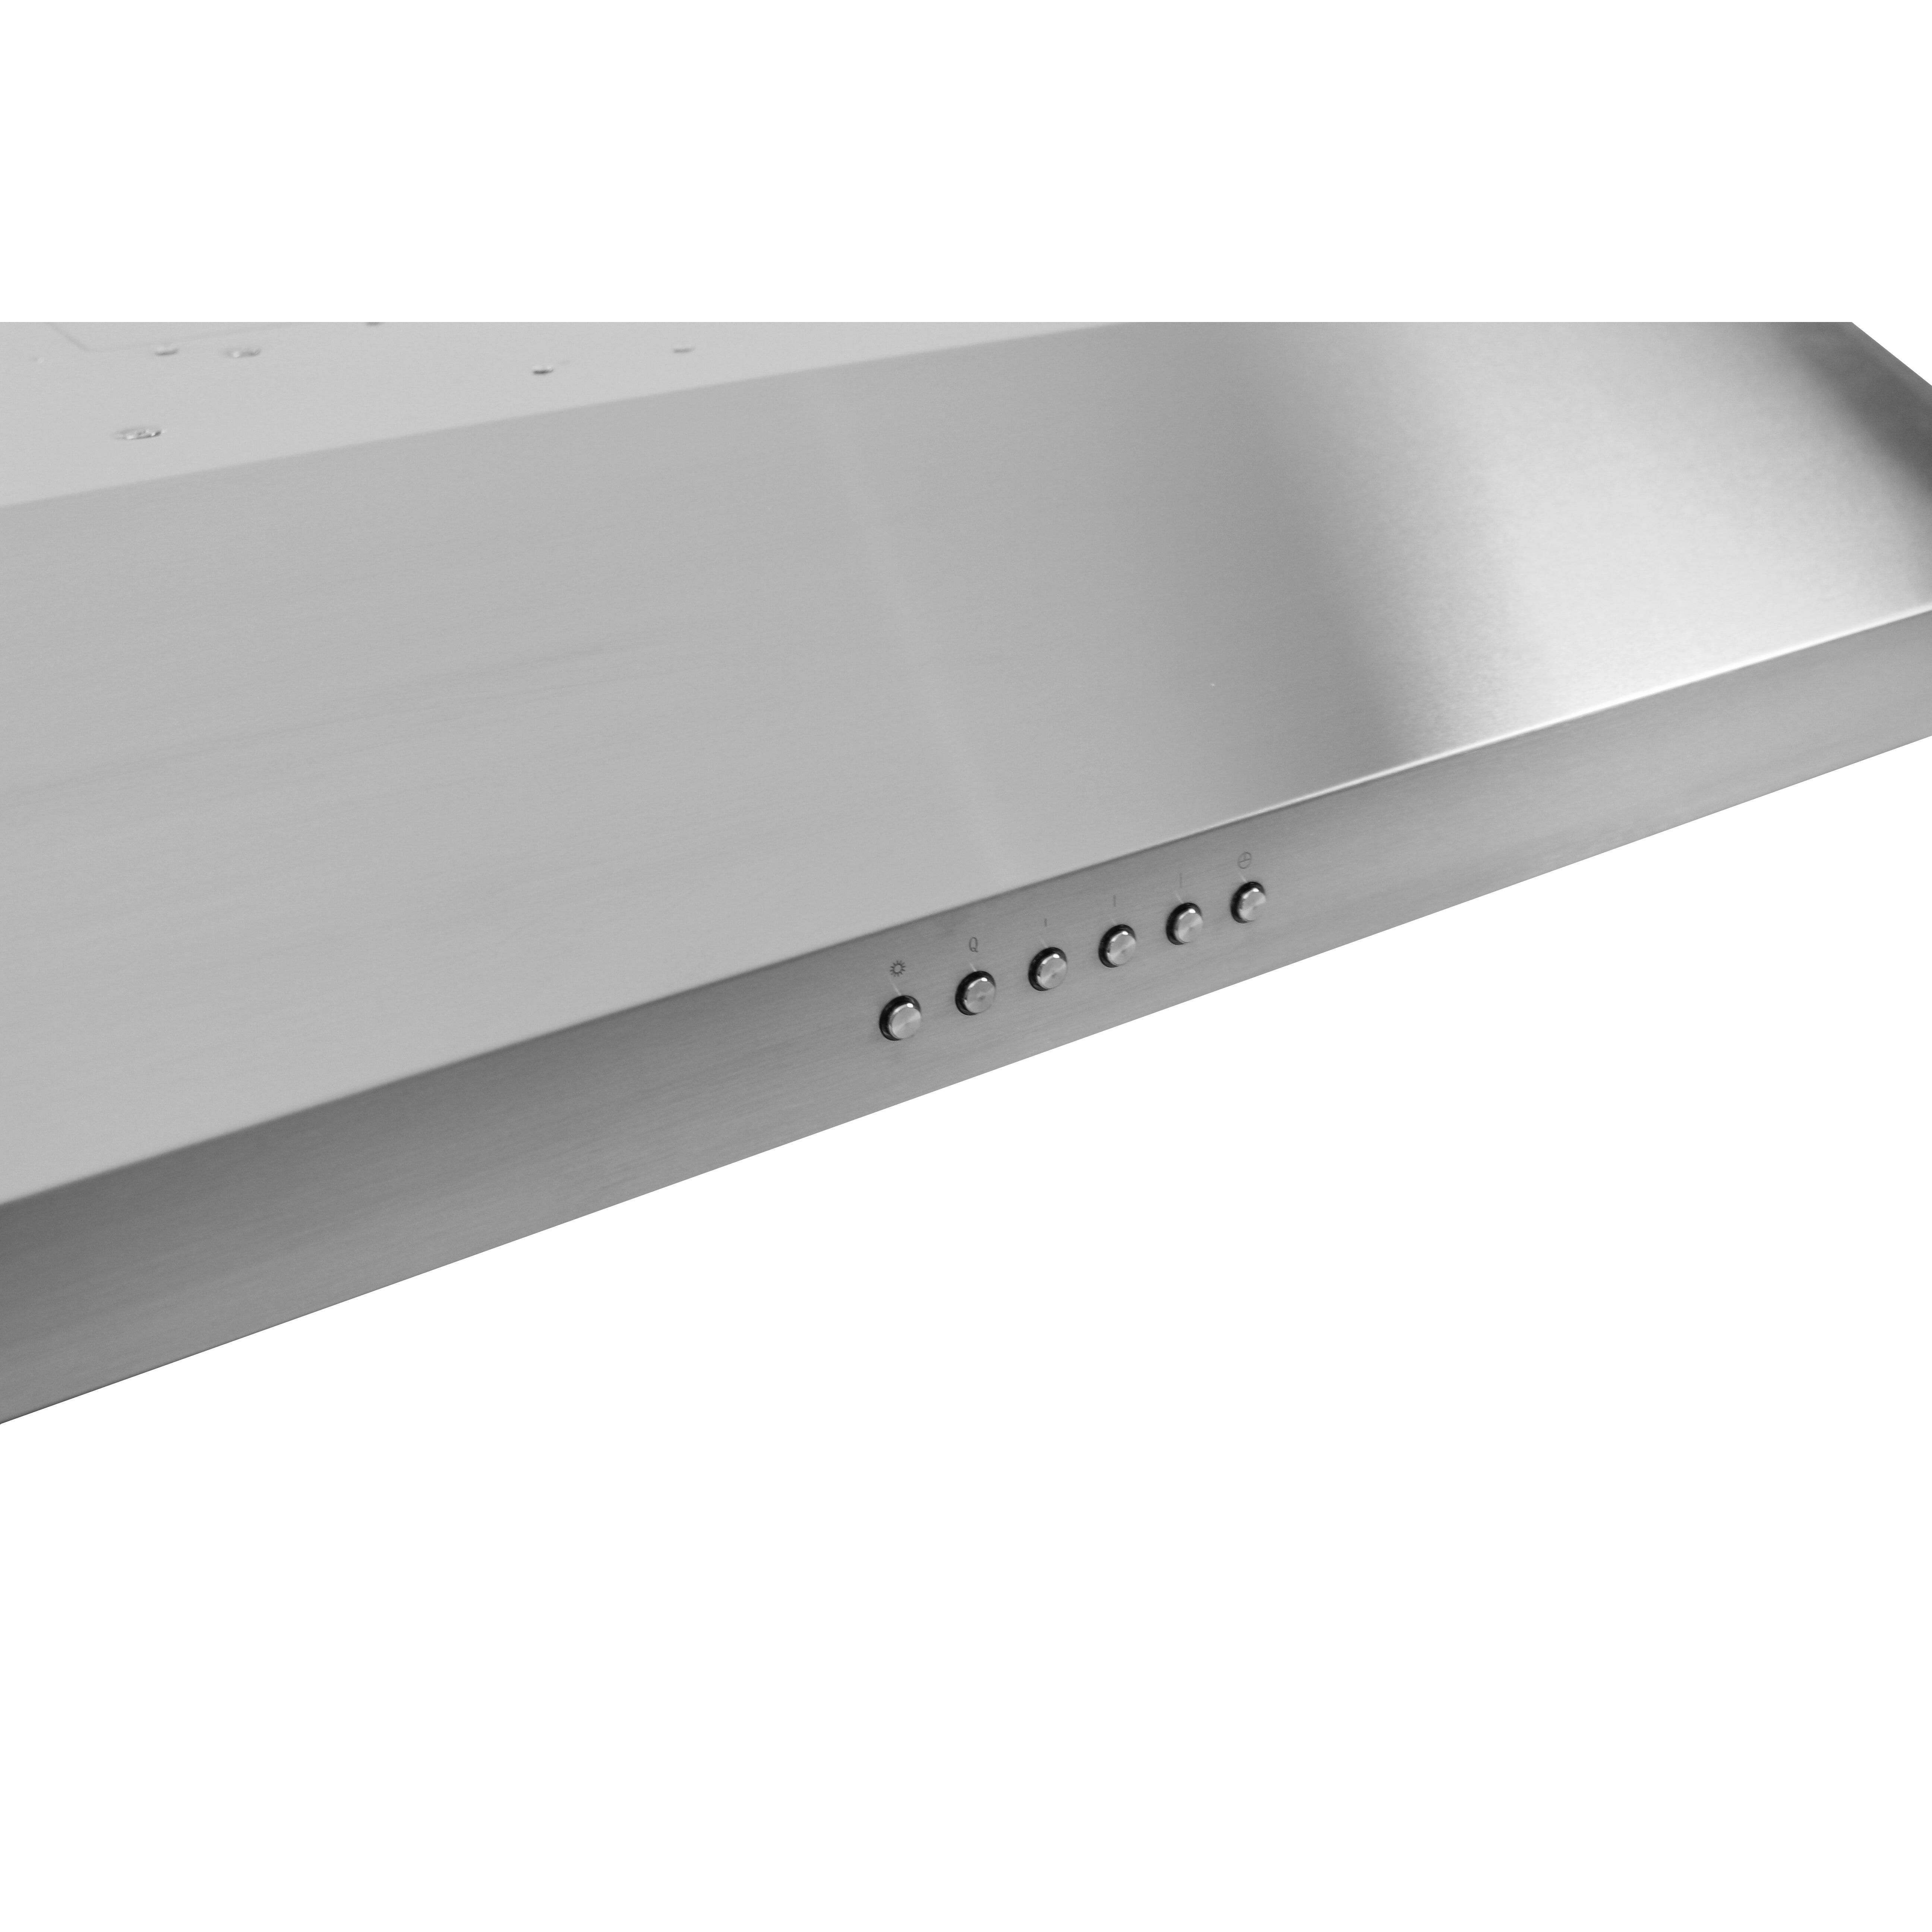 30 Under Cabinet Range Hood Proline Range Hoods 30 600 Cfm Ducted Under Cabinet Range Hood